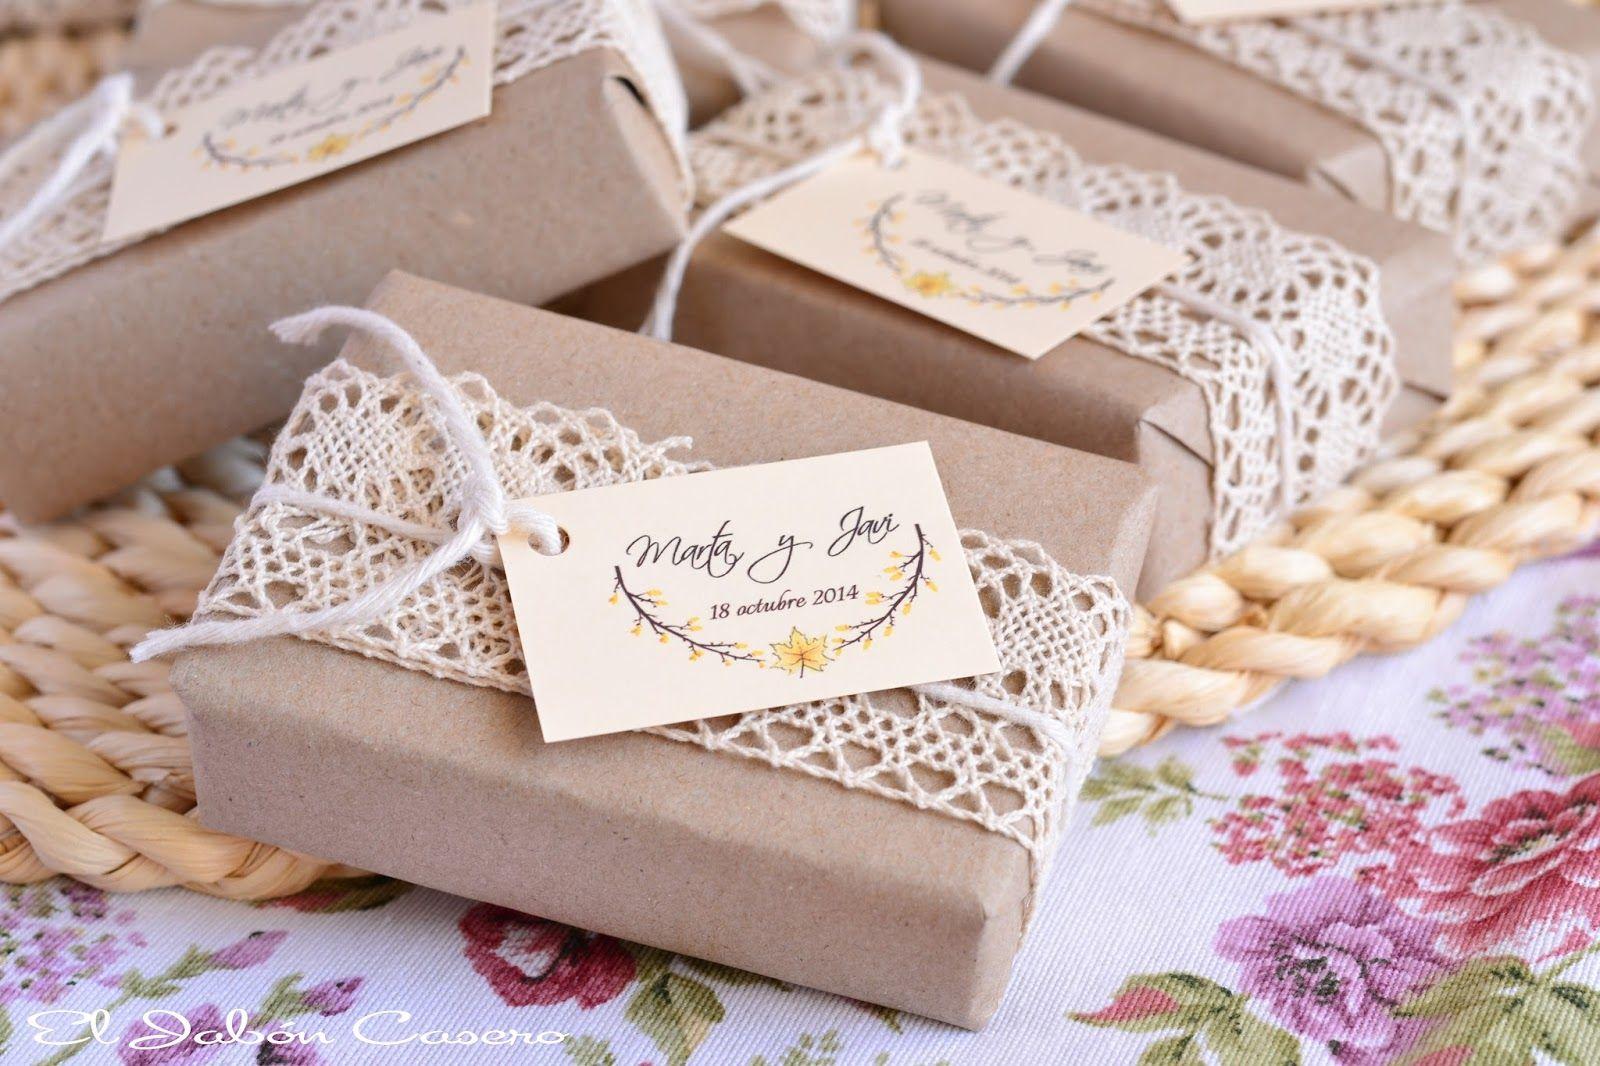 Jabones vintage, detalles de boda | Jabones | Wedding gift ...